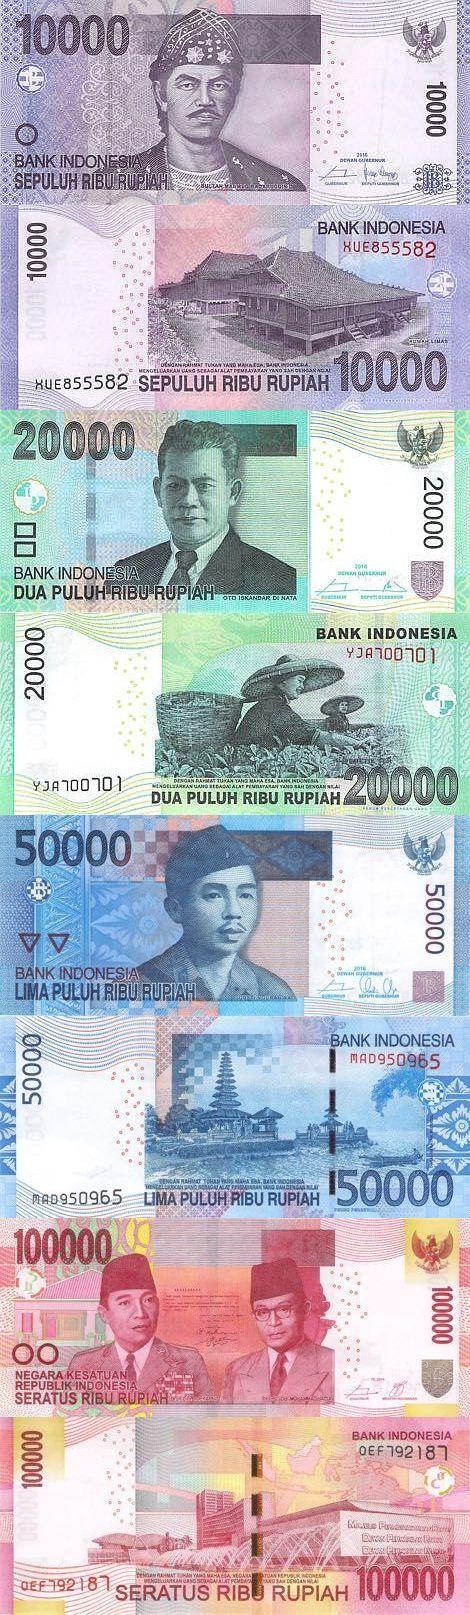 Indonesia 10,000-20,000-50,000-100,000 Rupiah 2016